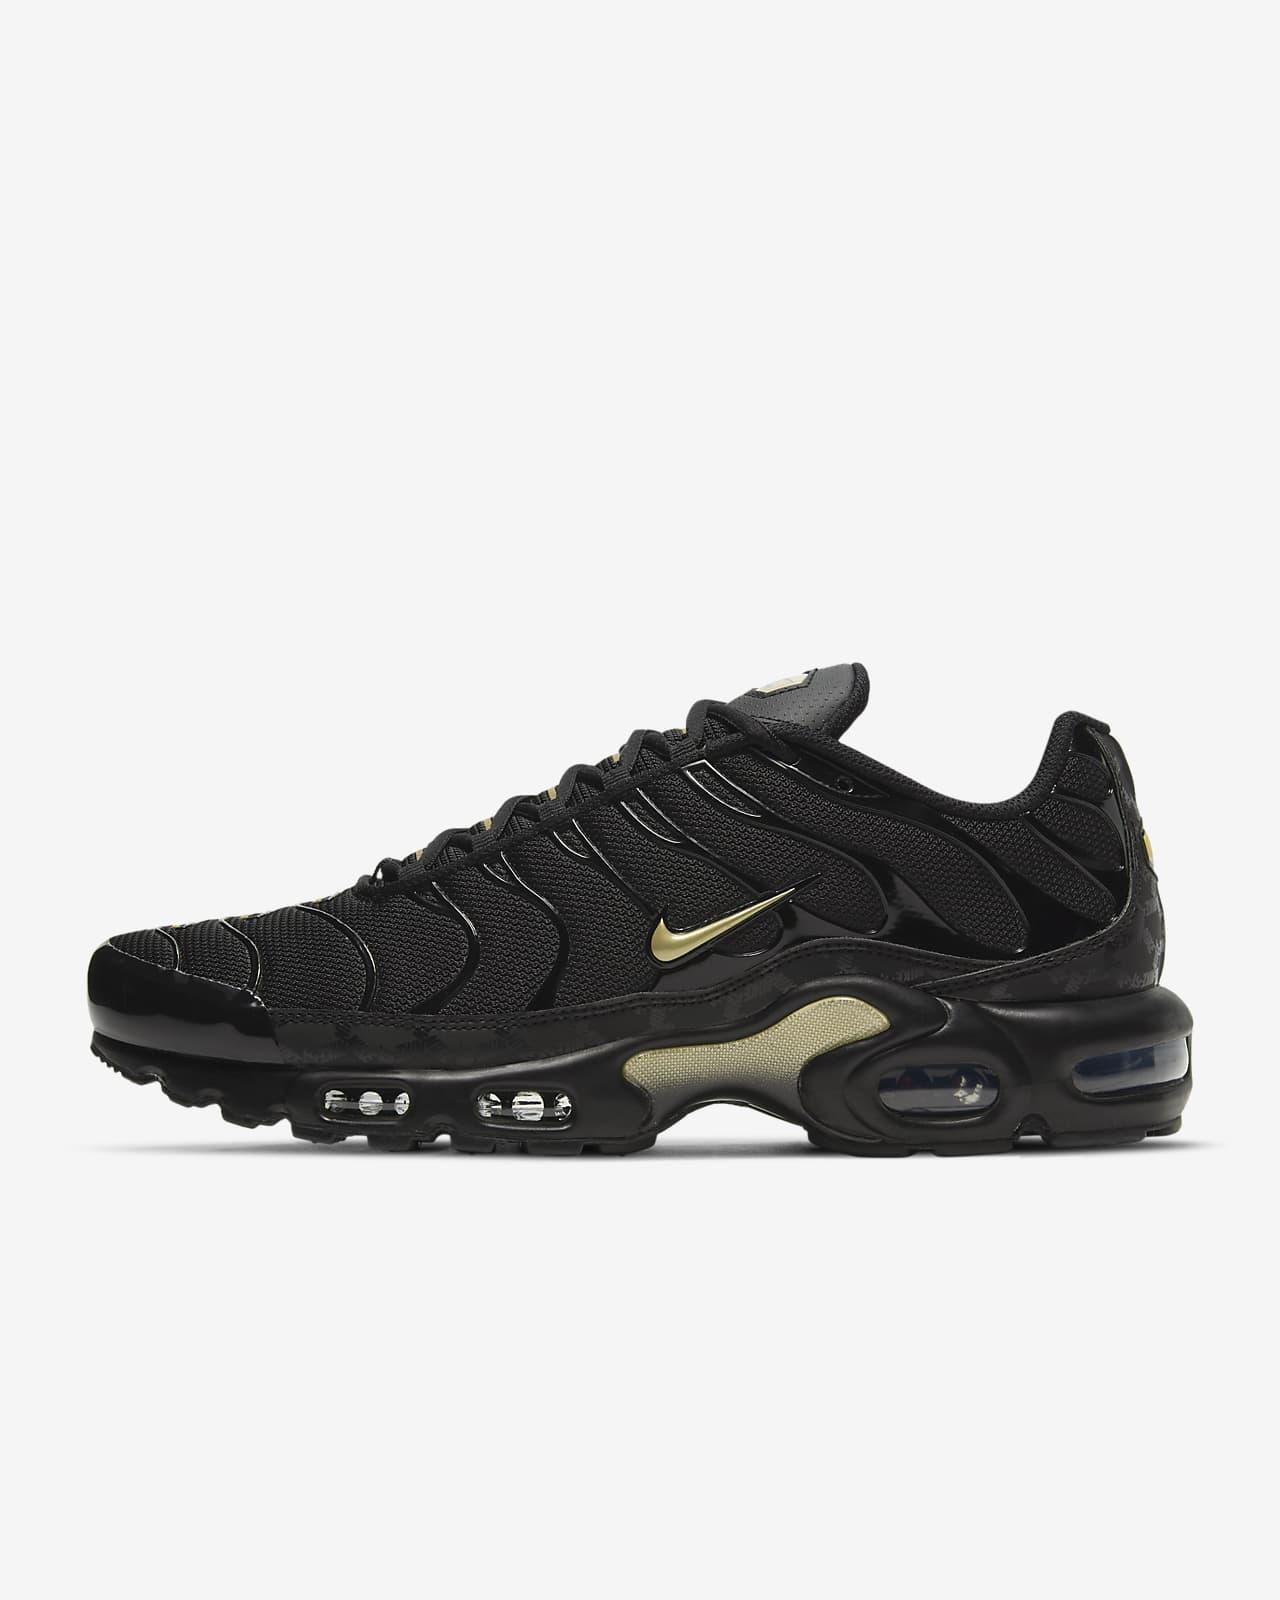 Nike Air Max Plus-sko til mænd